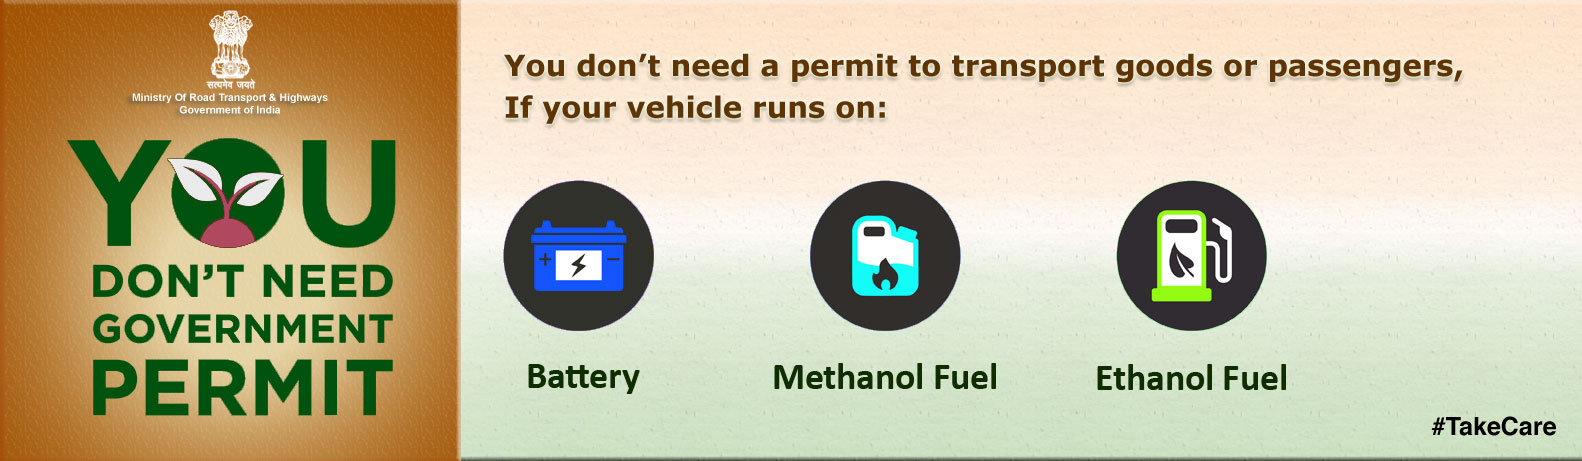 Home | Parivahan Sewa | Ministry of Road Transport